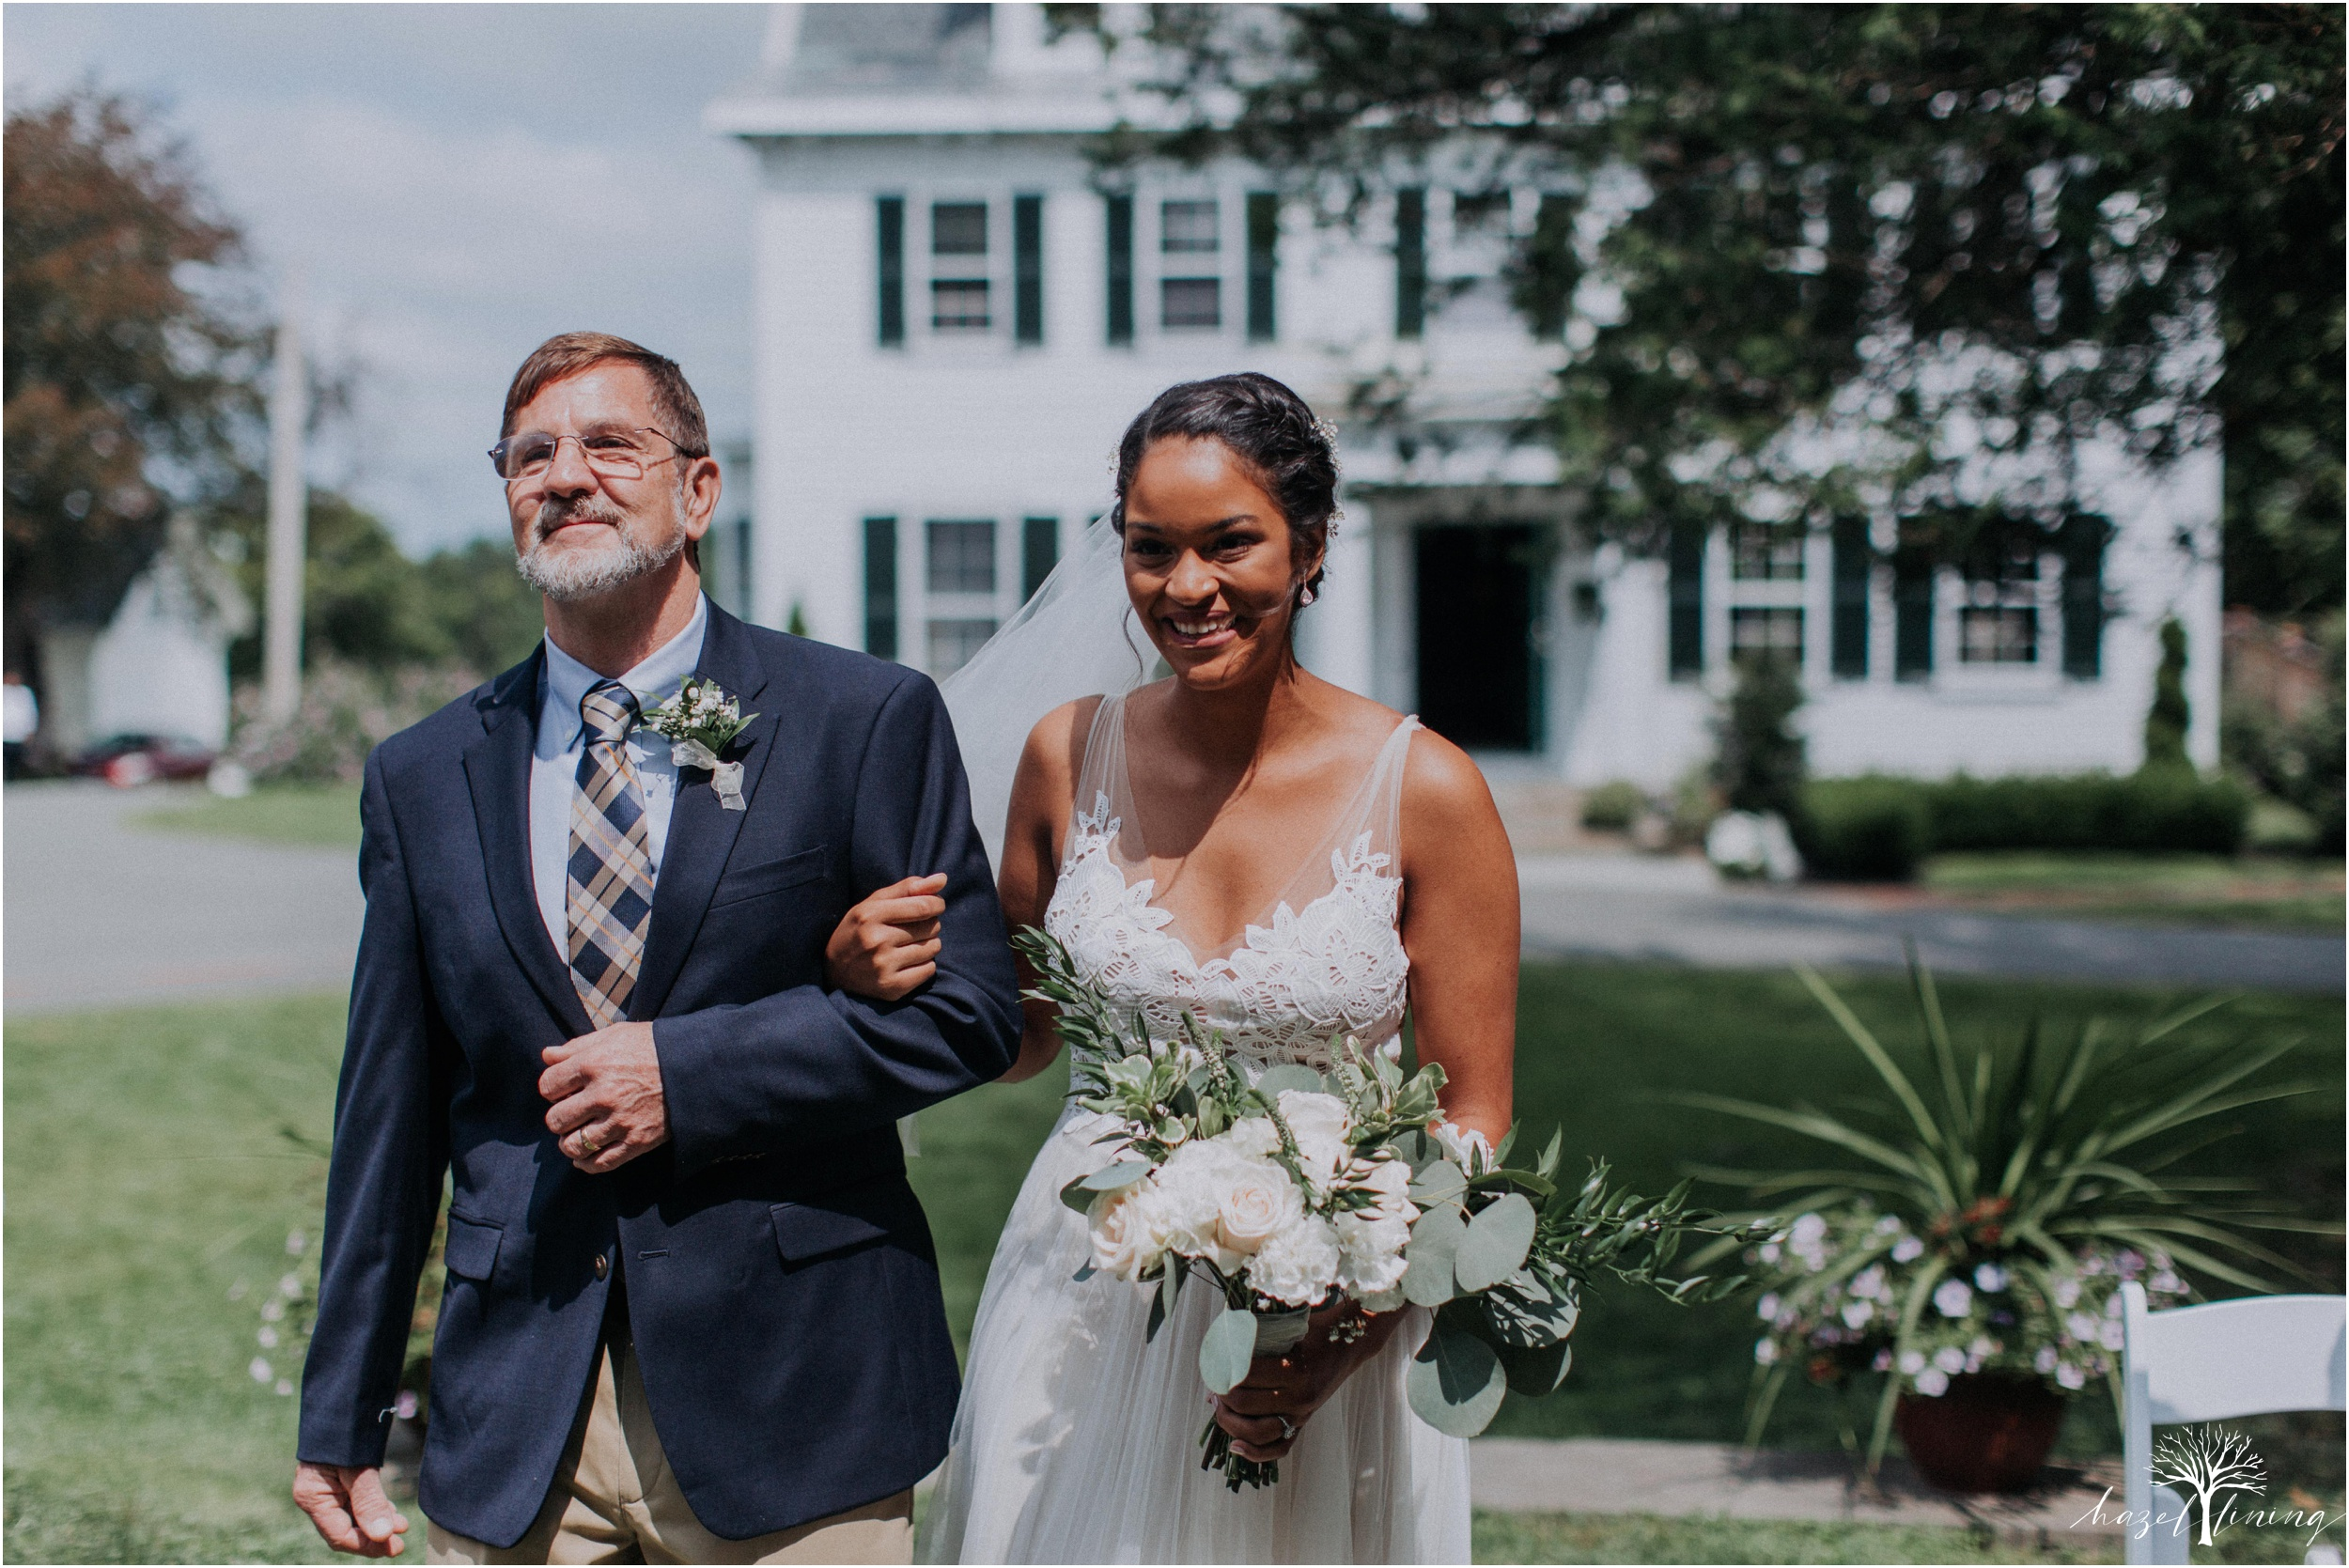 mariah-kreyling-samuel-sherratt-sherrattwiththeworld-peirce-farm-at-witch-hill-boston-massachusetts-wedding-photography-hazel-lining-travel-wedding-elopement-photography_0077.jpg